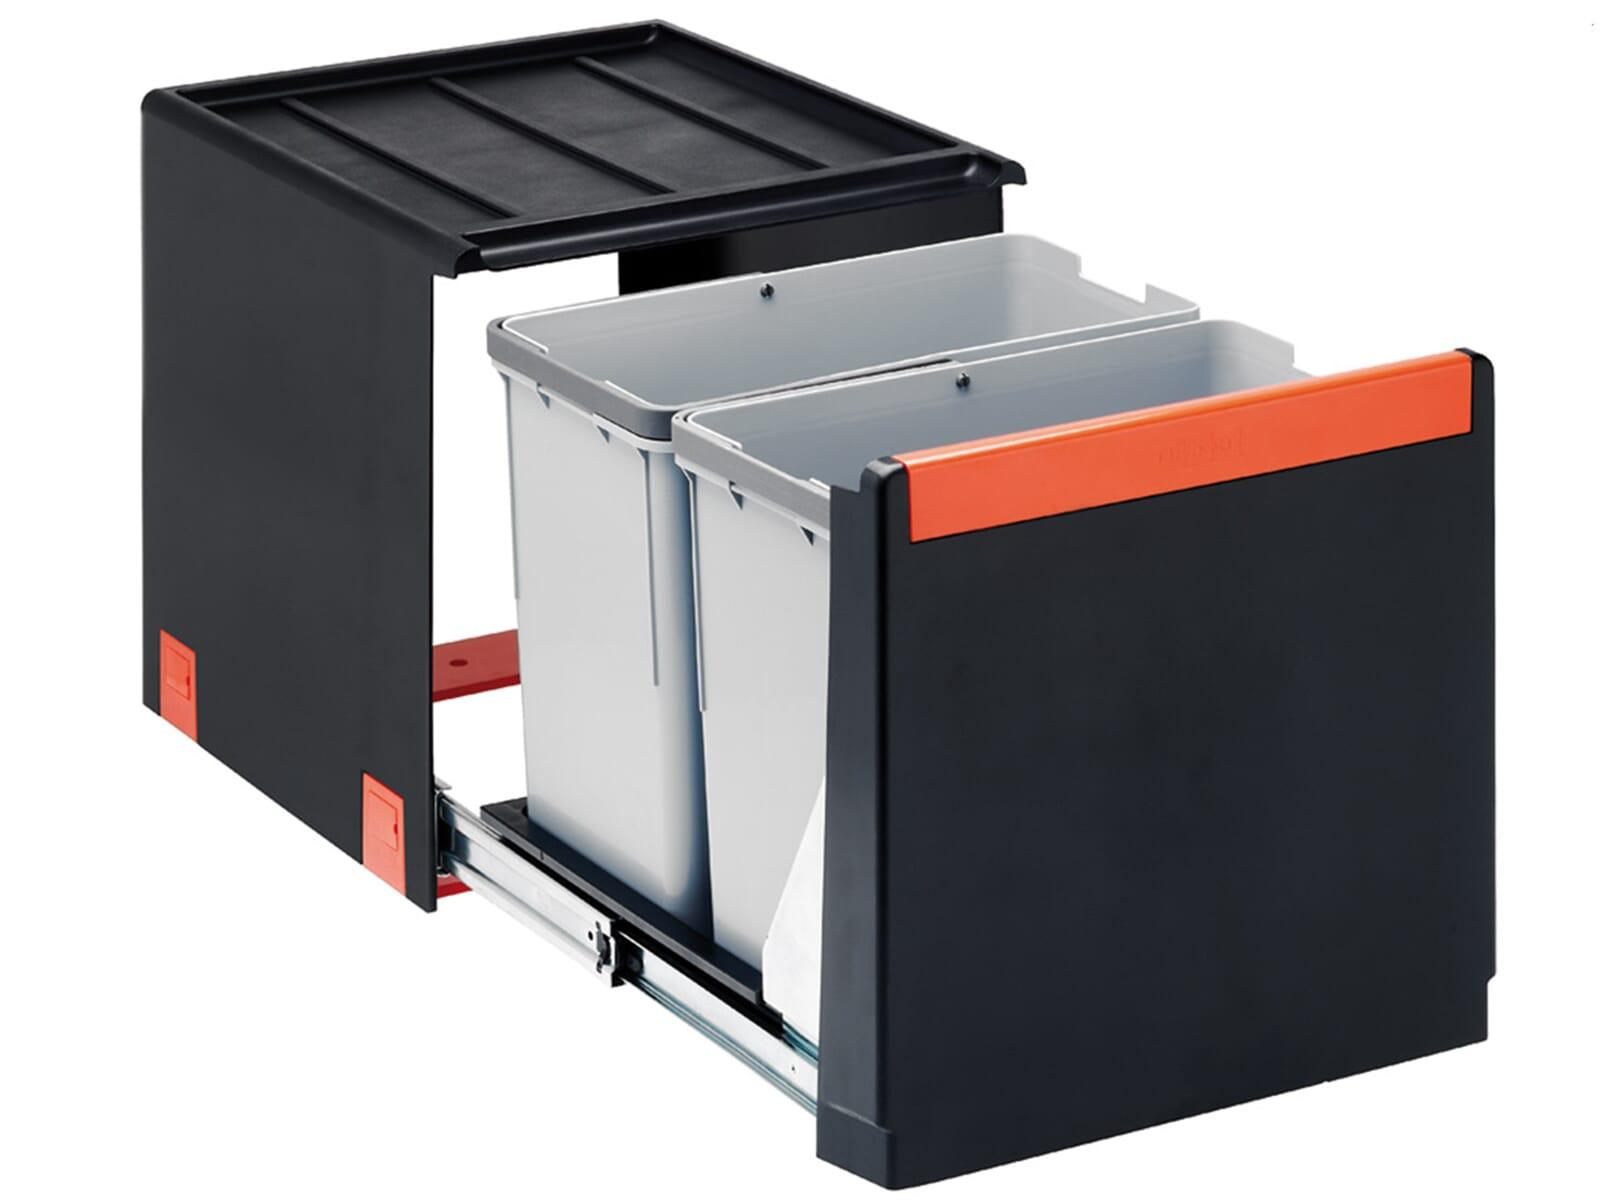 Produktabbildung Franke Sorter Cube 40 - 134.0039.330 Einbau Abfallsammler